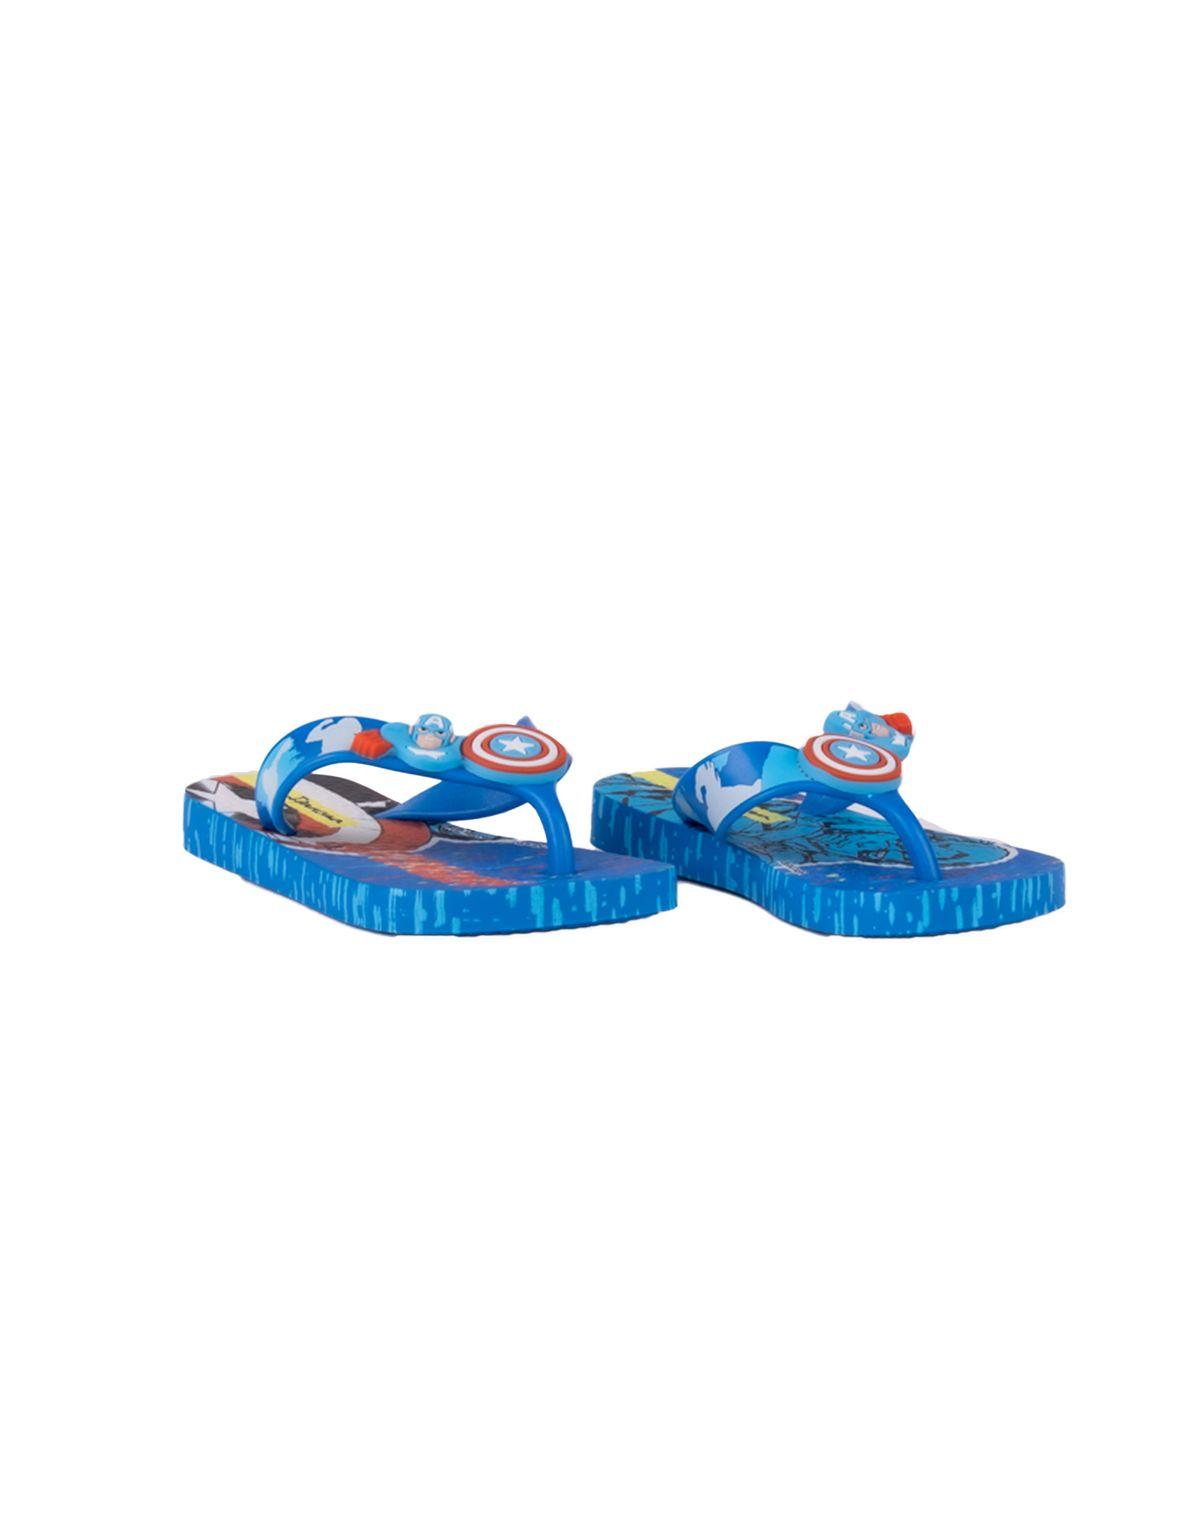 557977004-chinelo-infantil-menino-avengers-ipanema-azul-29-0-da8